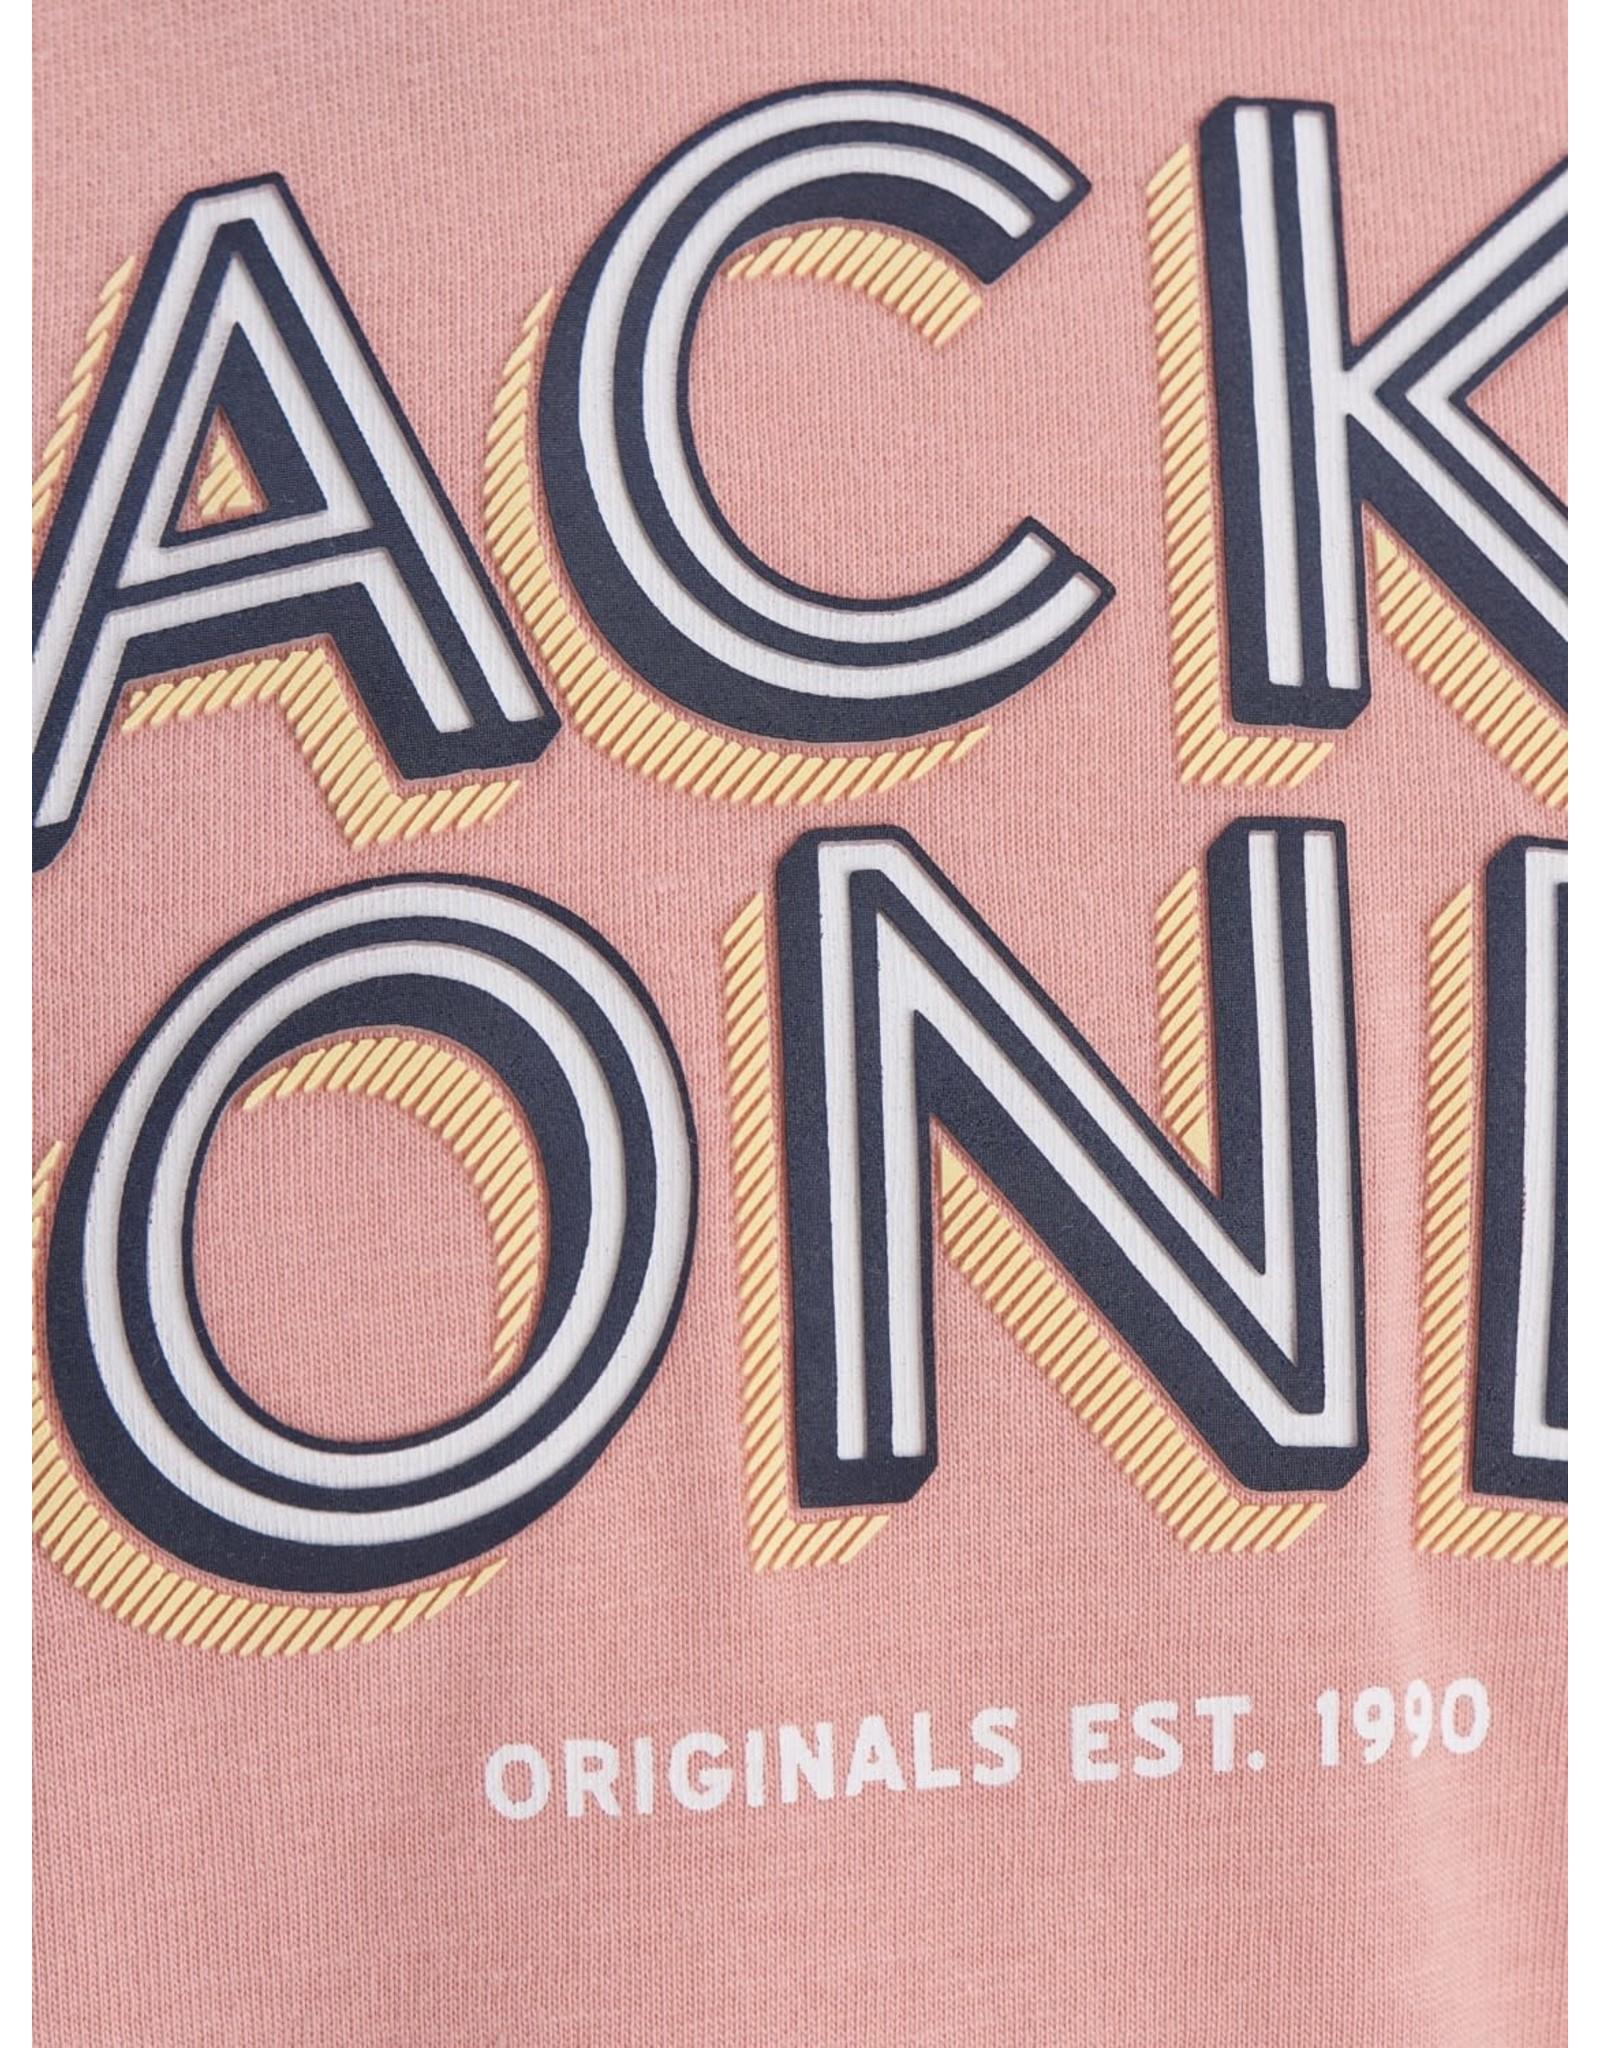 Jack & jones junior T-shirt Venicebeach crew neck rose